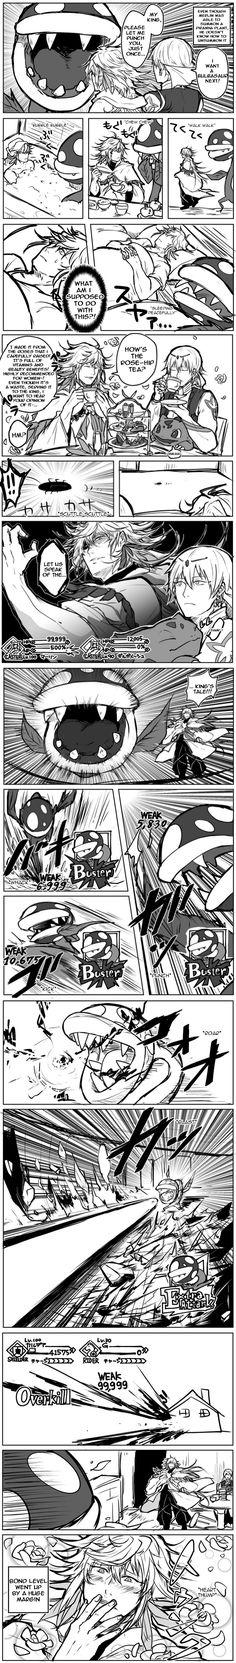 FGO x Pokemon x Super Mario